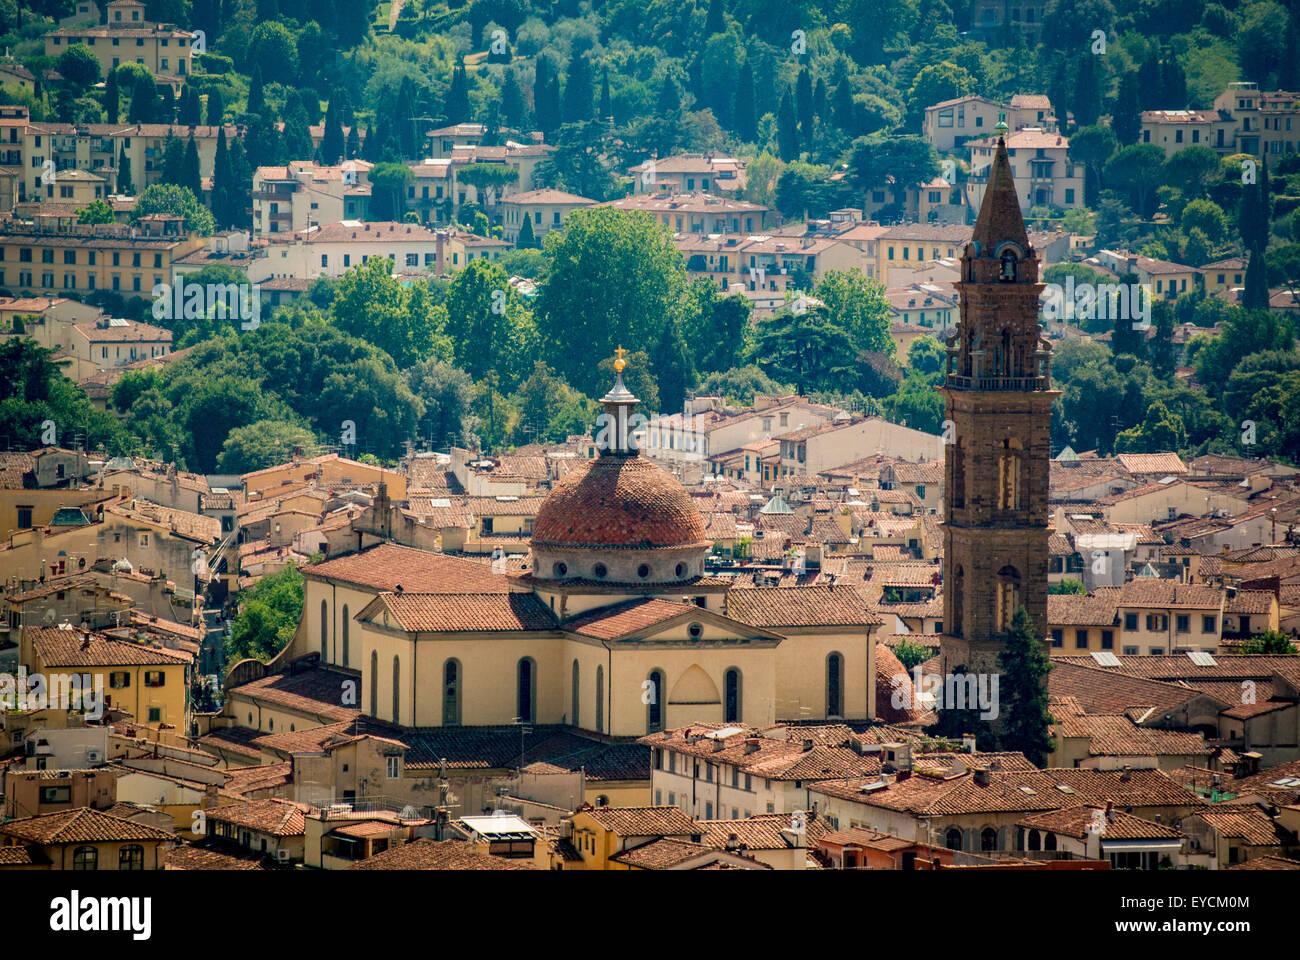 The Basilica of Santa Maria del Santo Spirito. Florence, Italy. Stock Photo